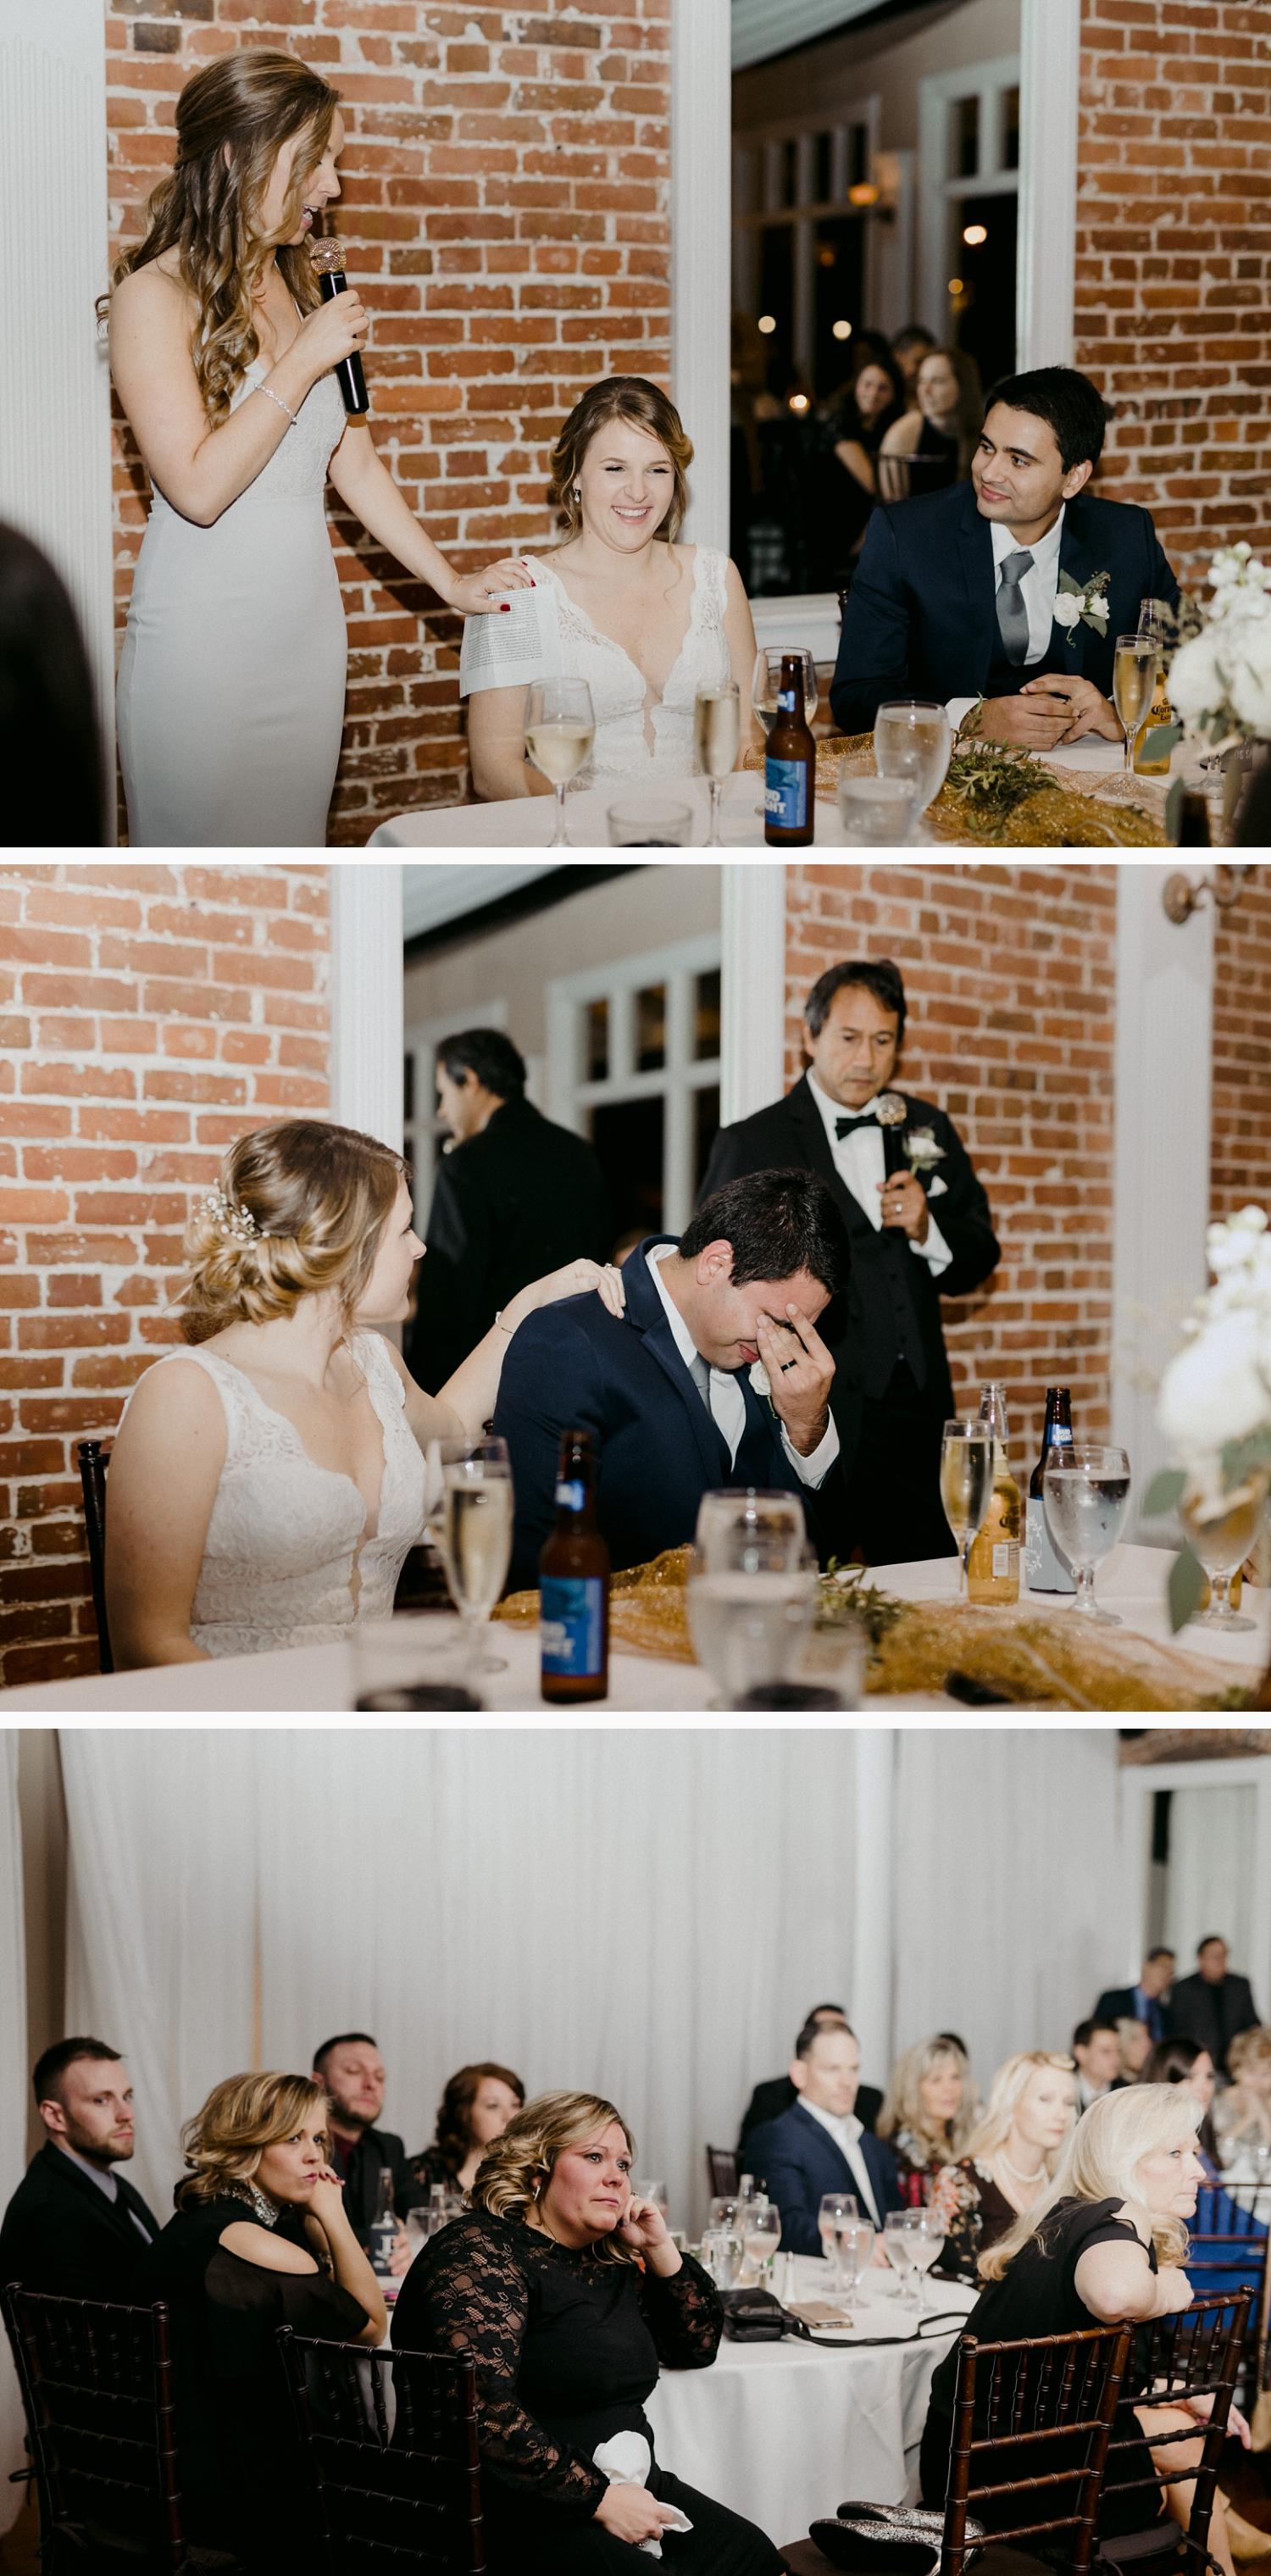 Tiffany-And-Junior-The-White-Room-St-Augustine-Wedding_0045.jpg